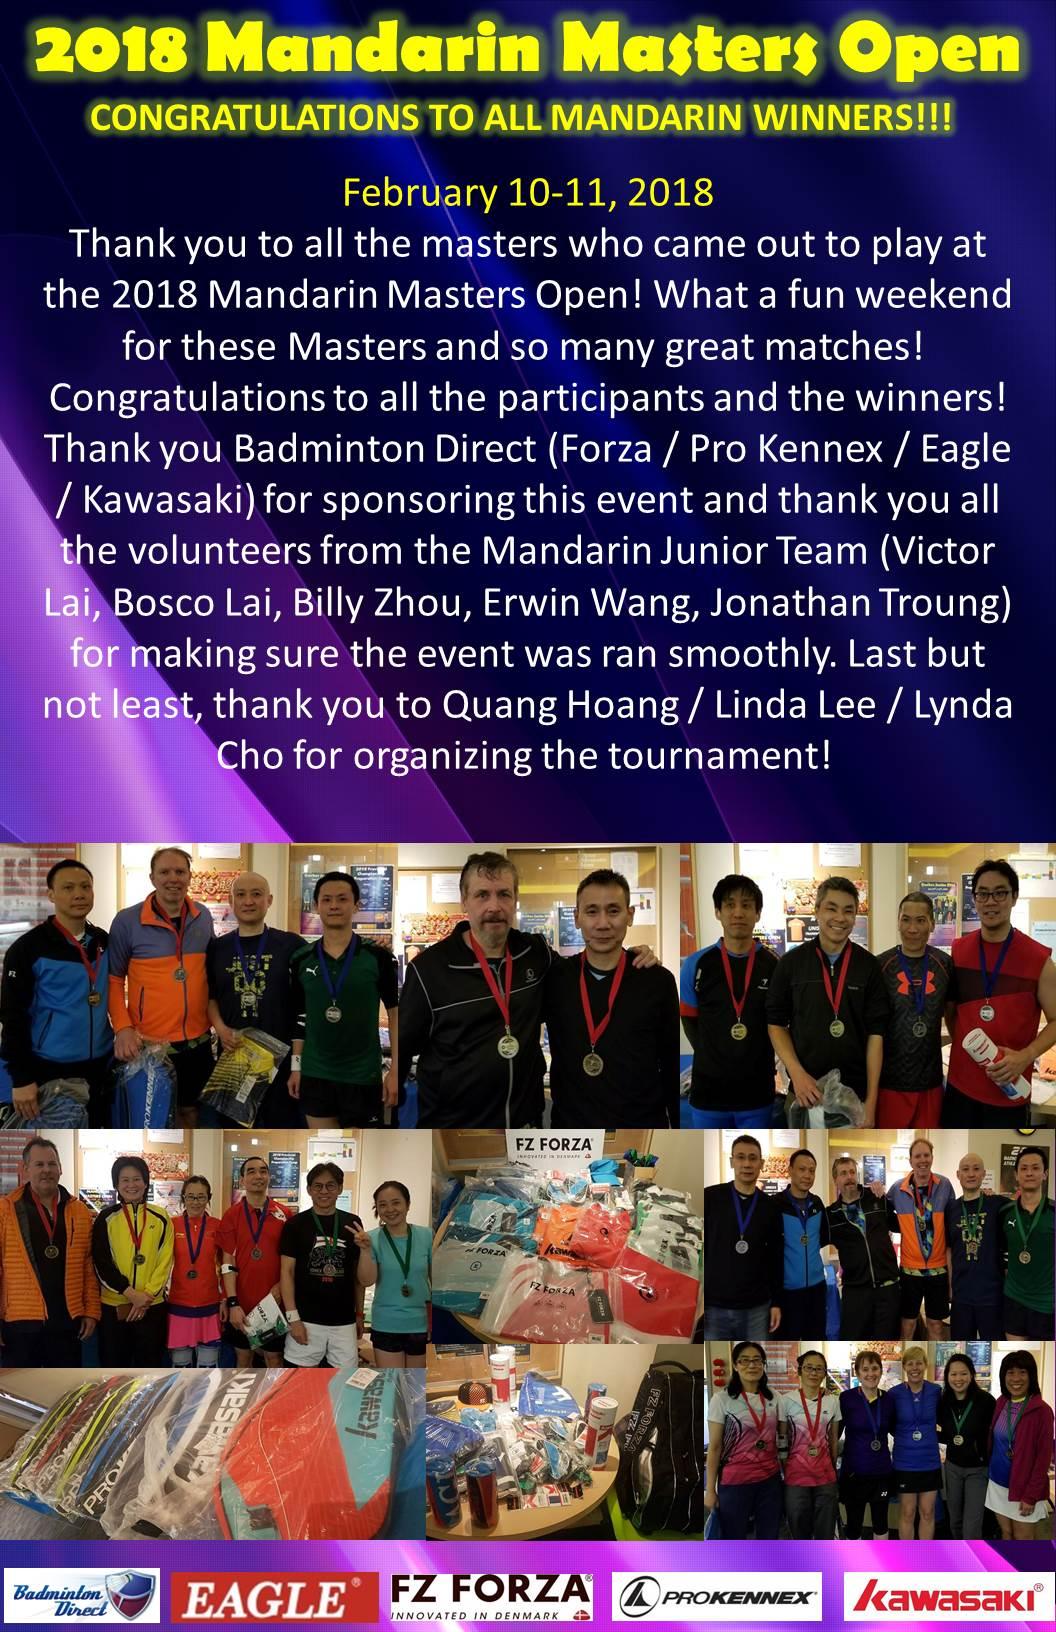 2018 Mandarin Masters Open Winners